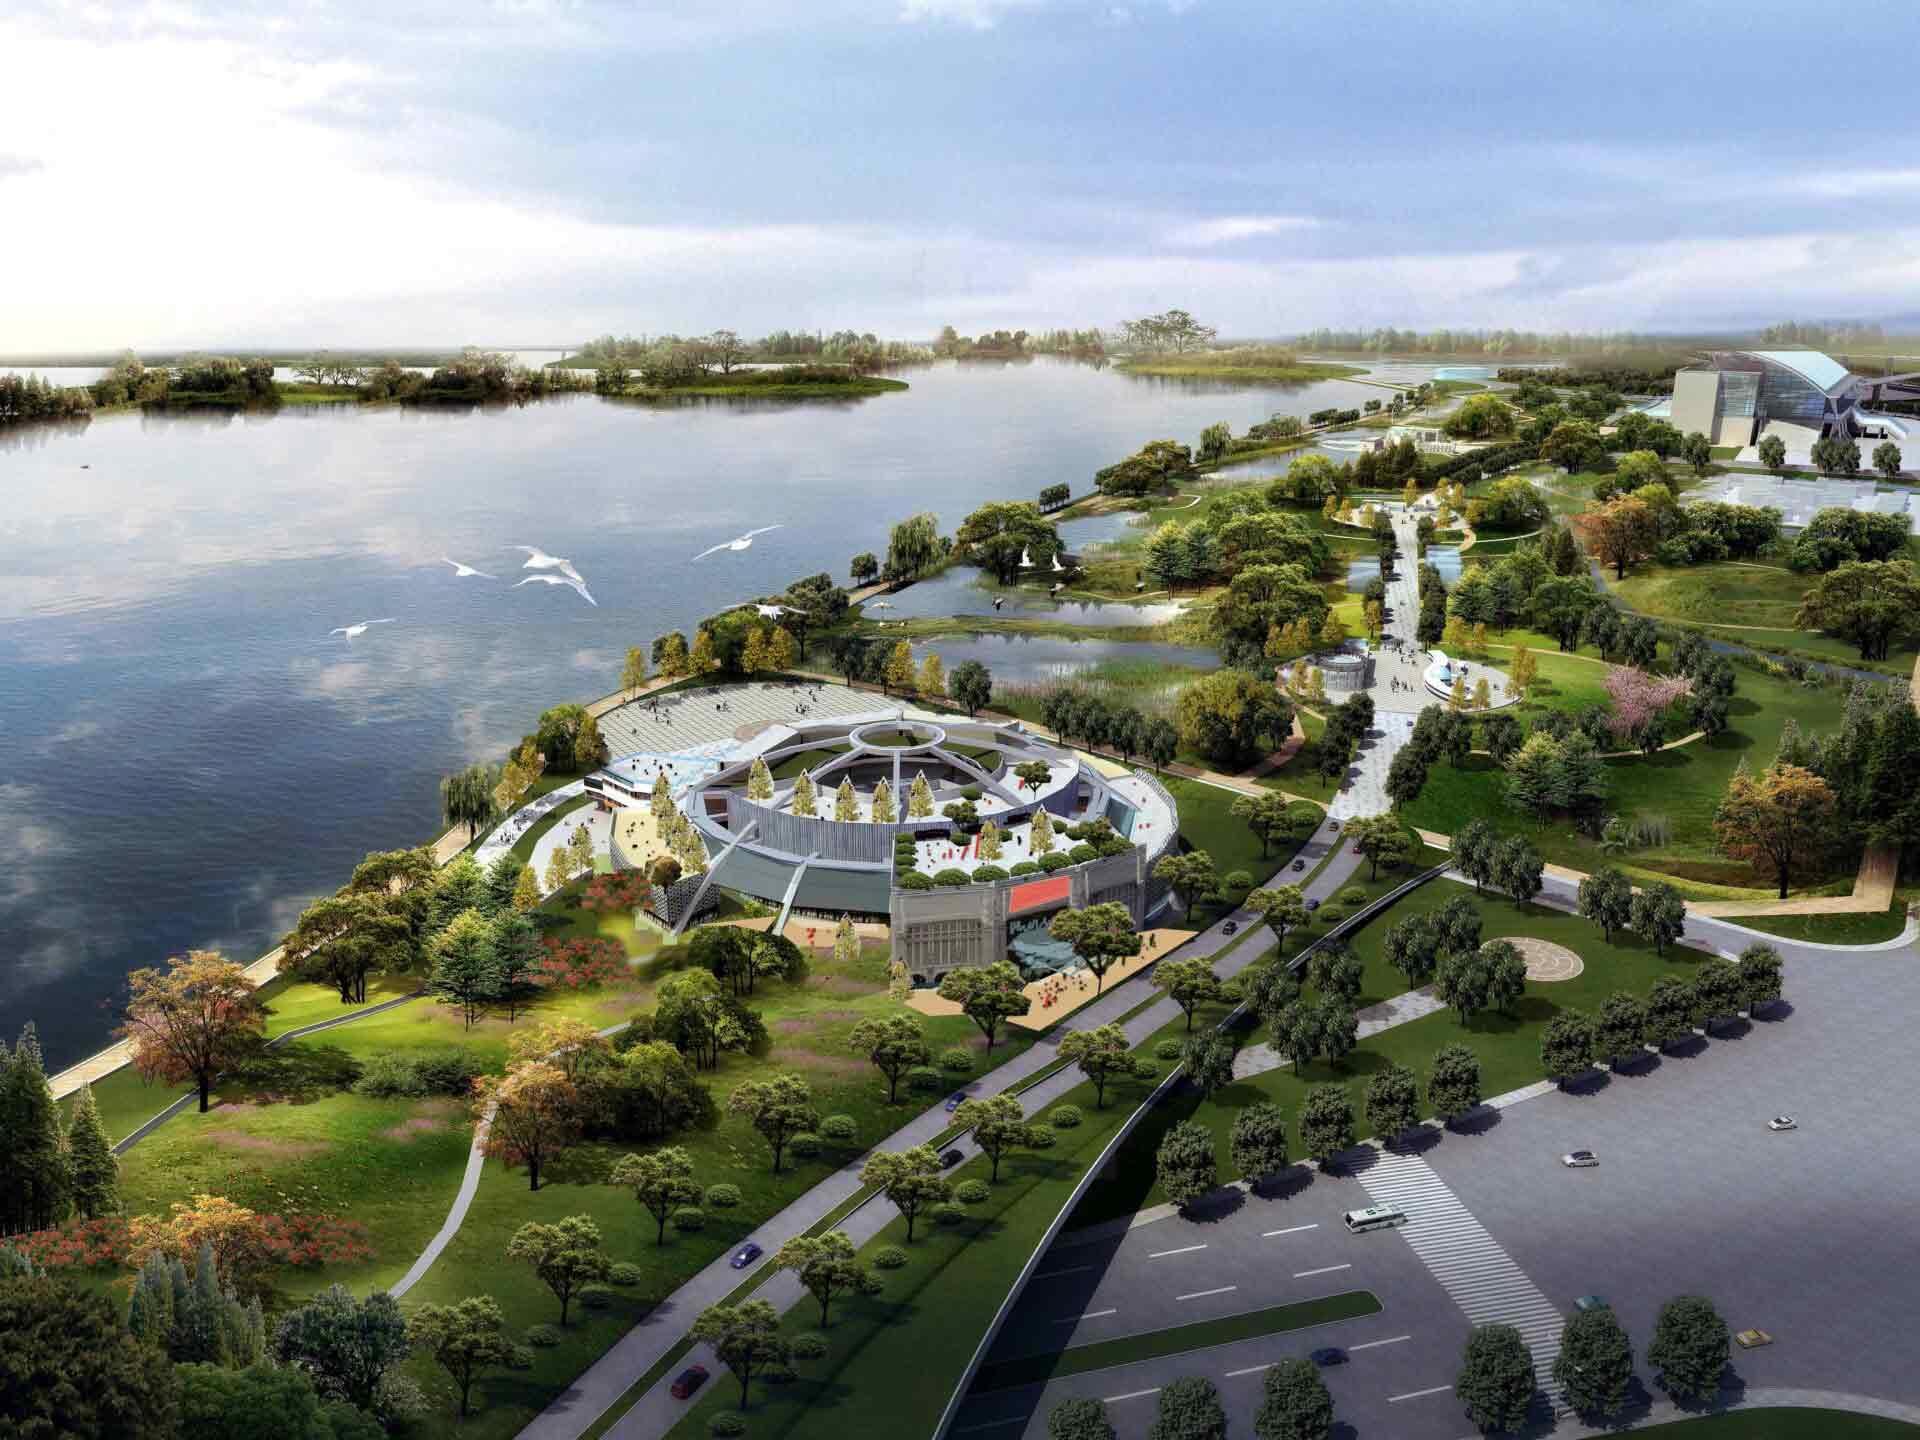 nanjing lake 03 - Education and Community Projects